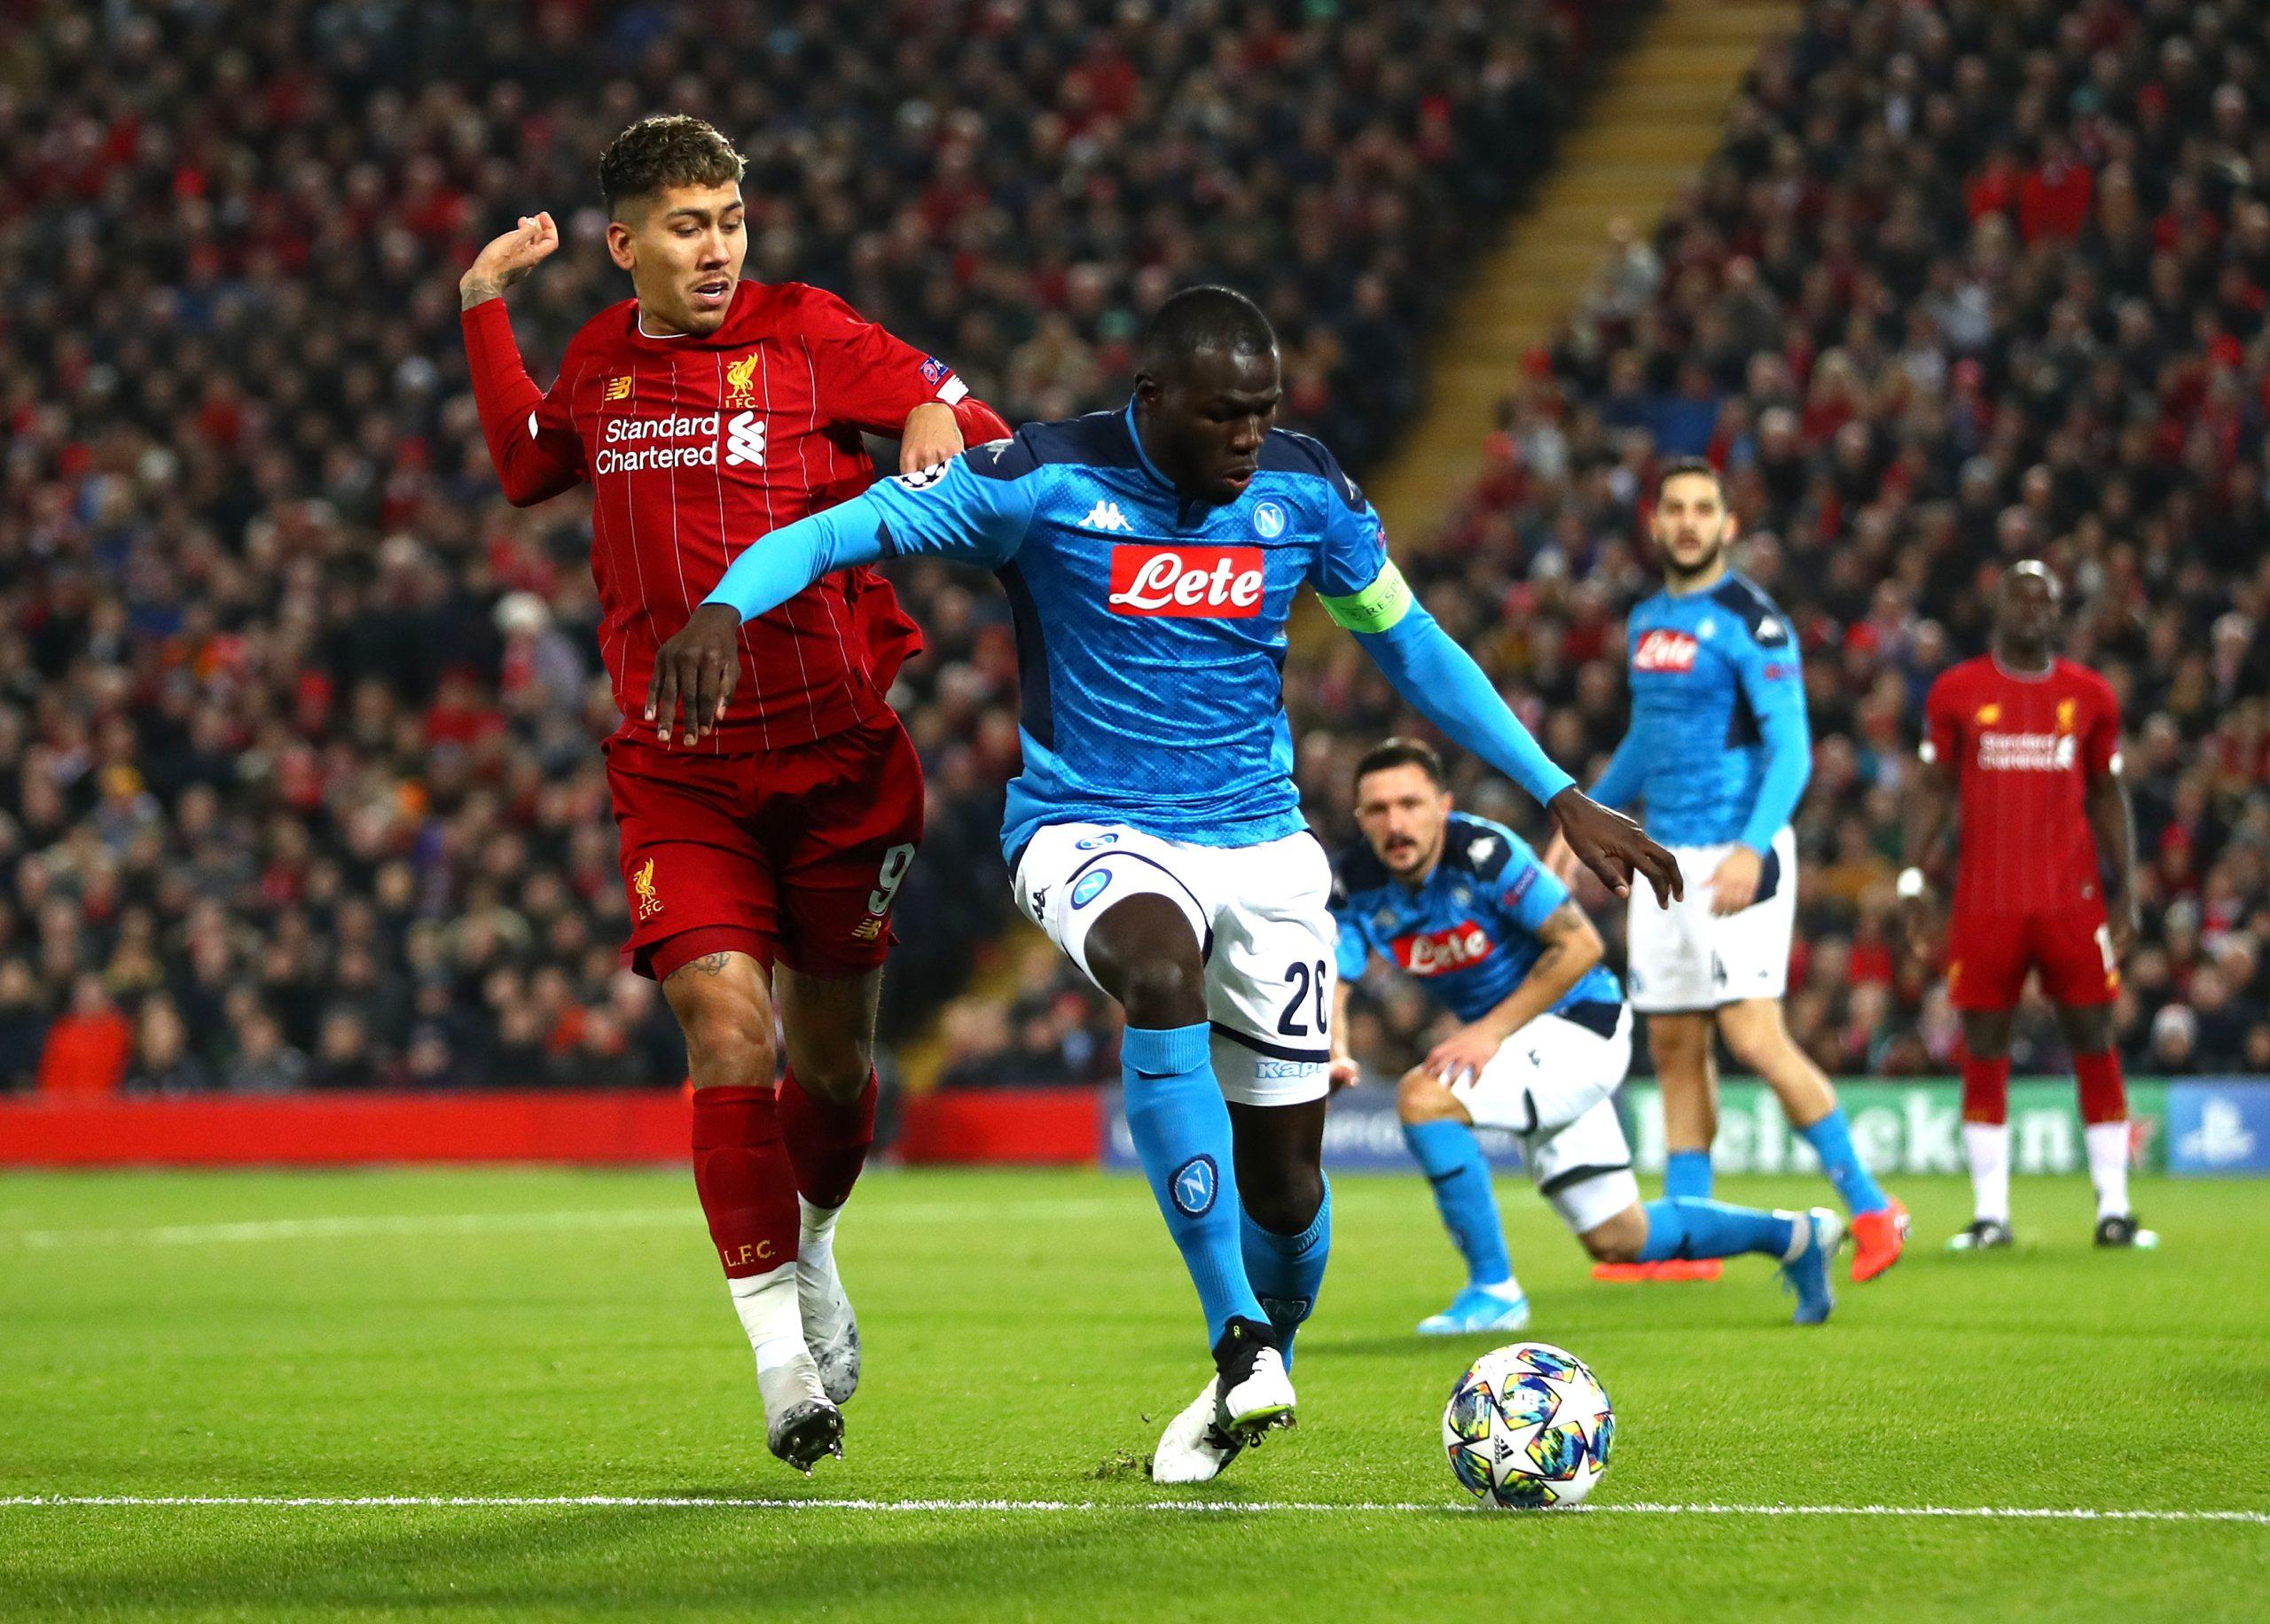 Liverpool Fc V Ssc Napoli Group E Uefa Champions League